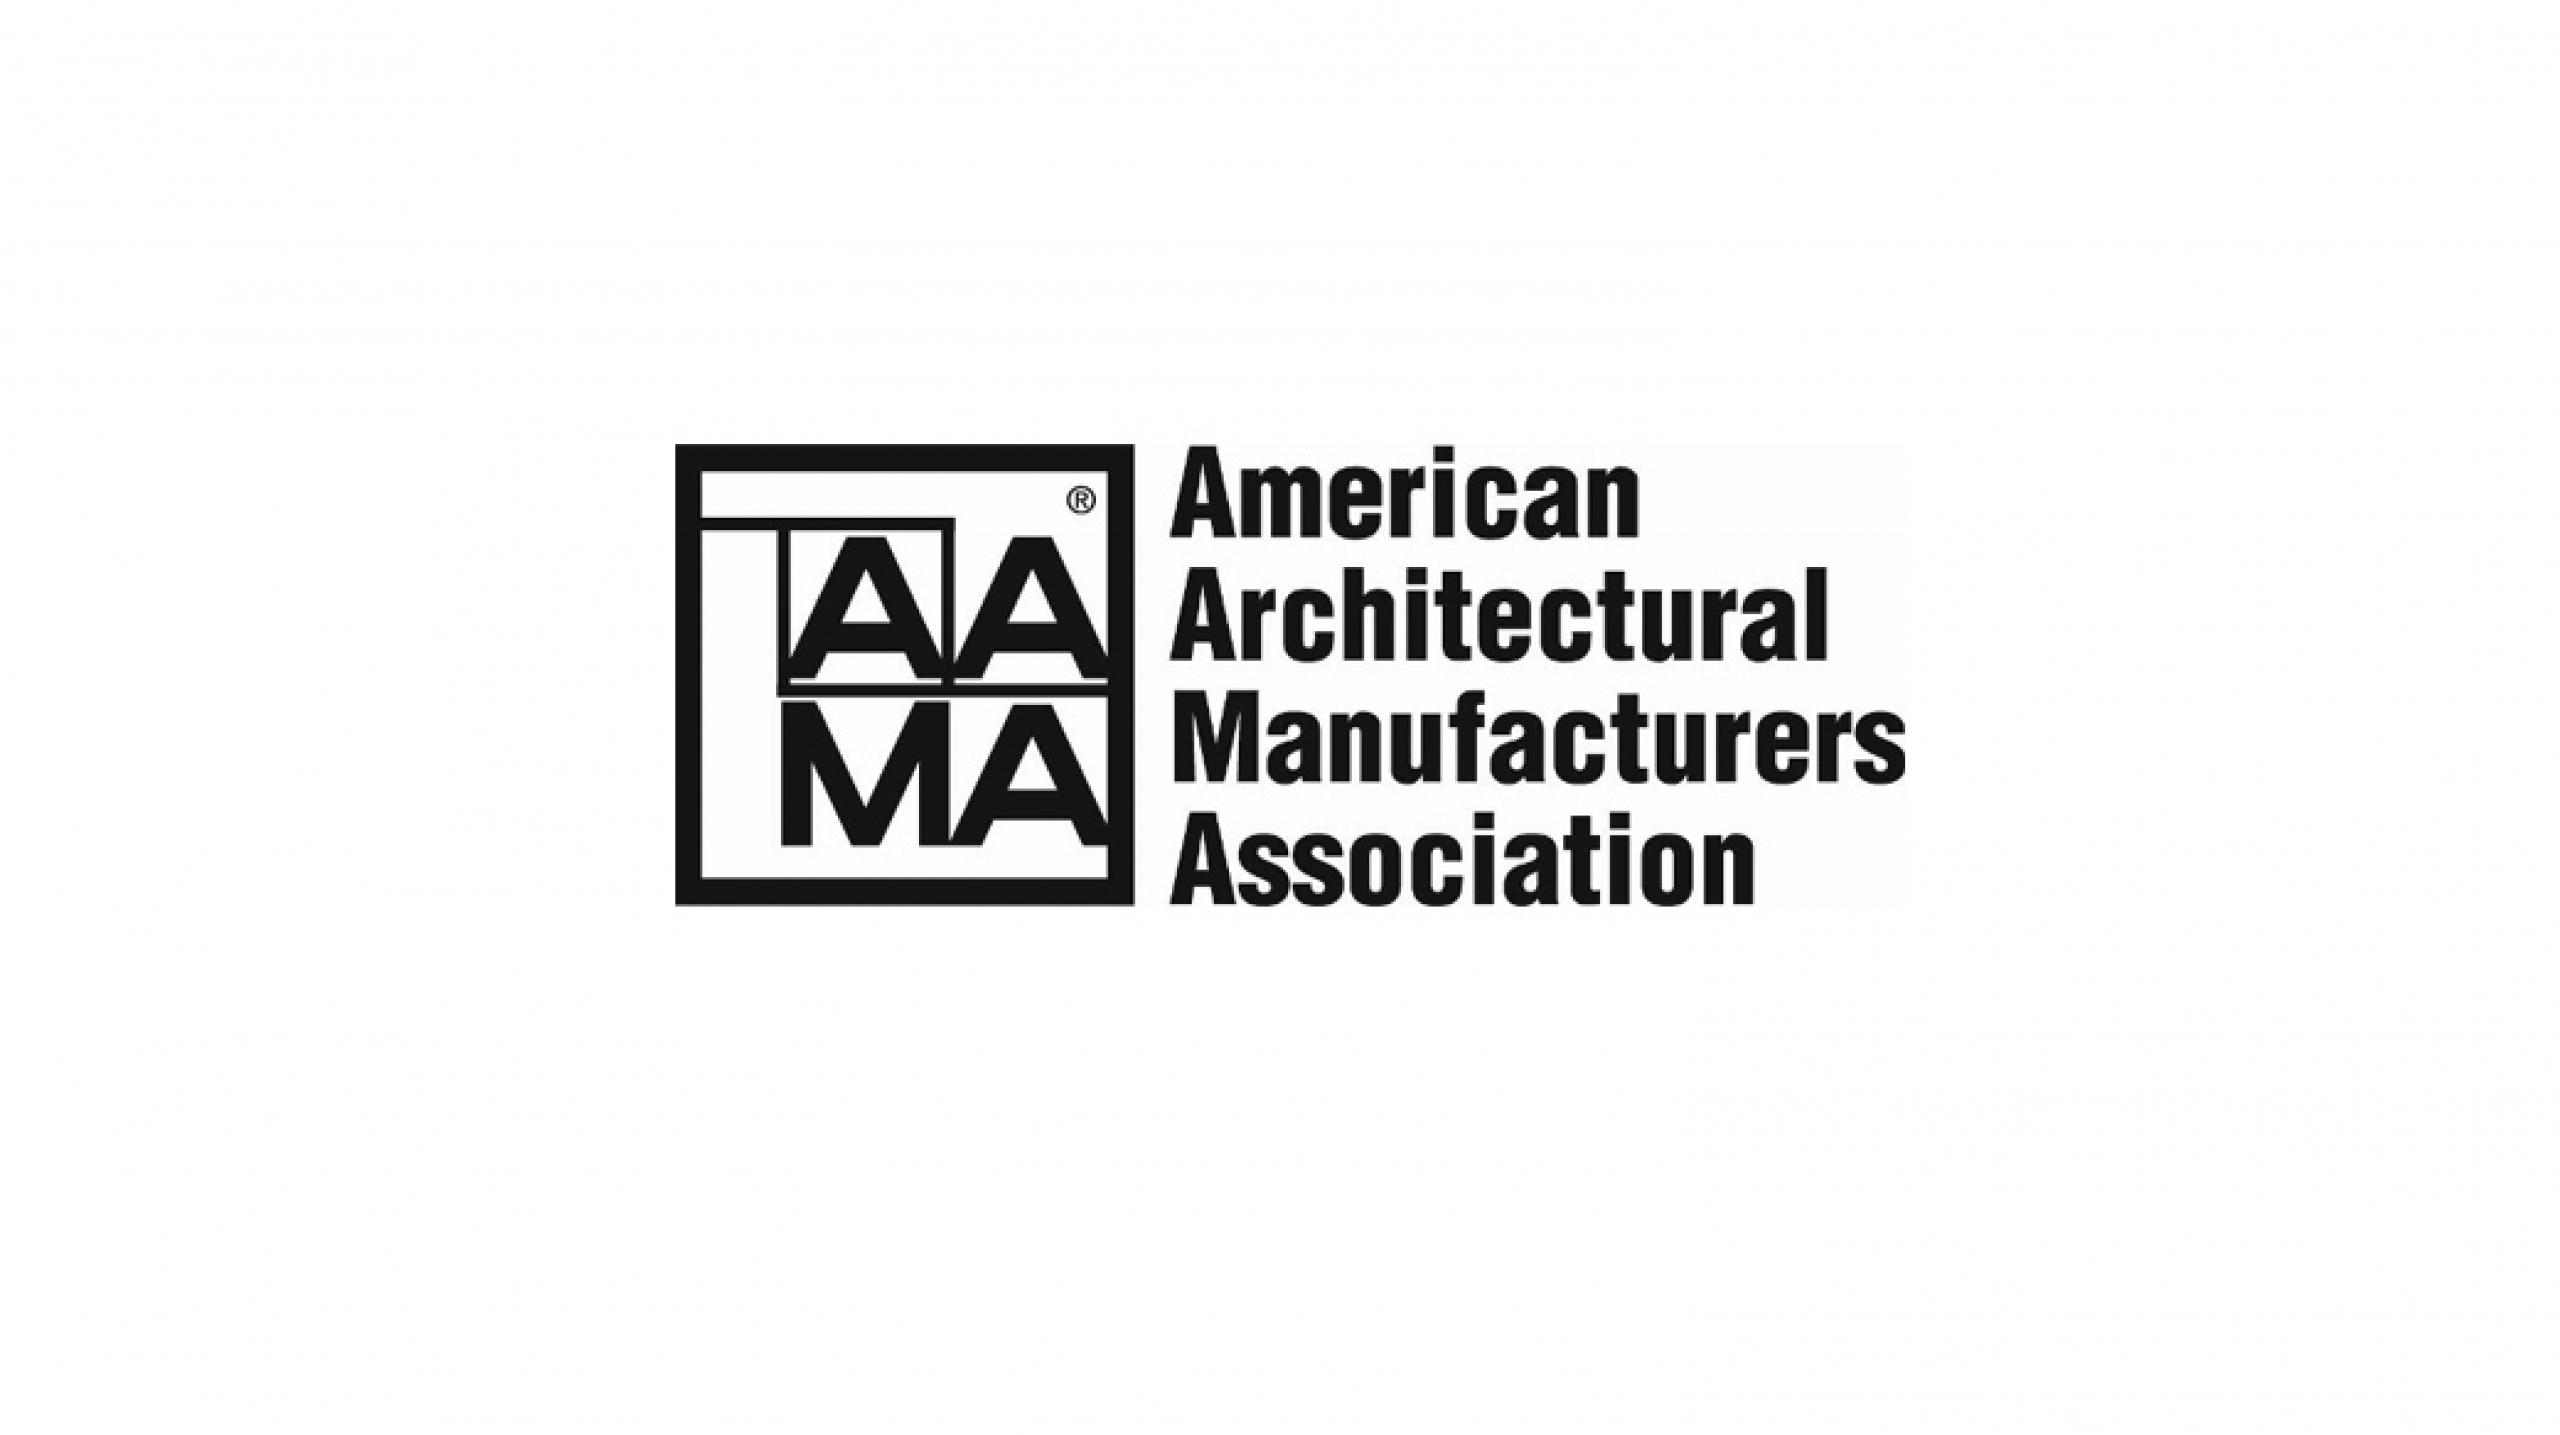 American Architectural Manufacturers Association Logo